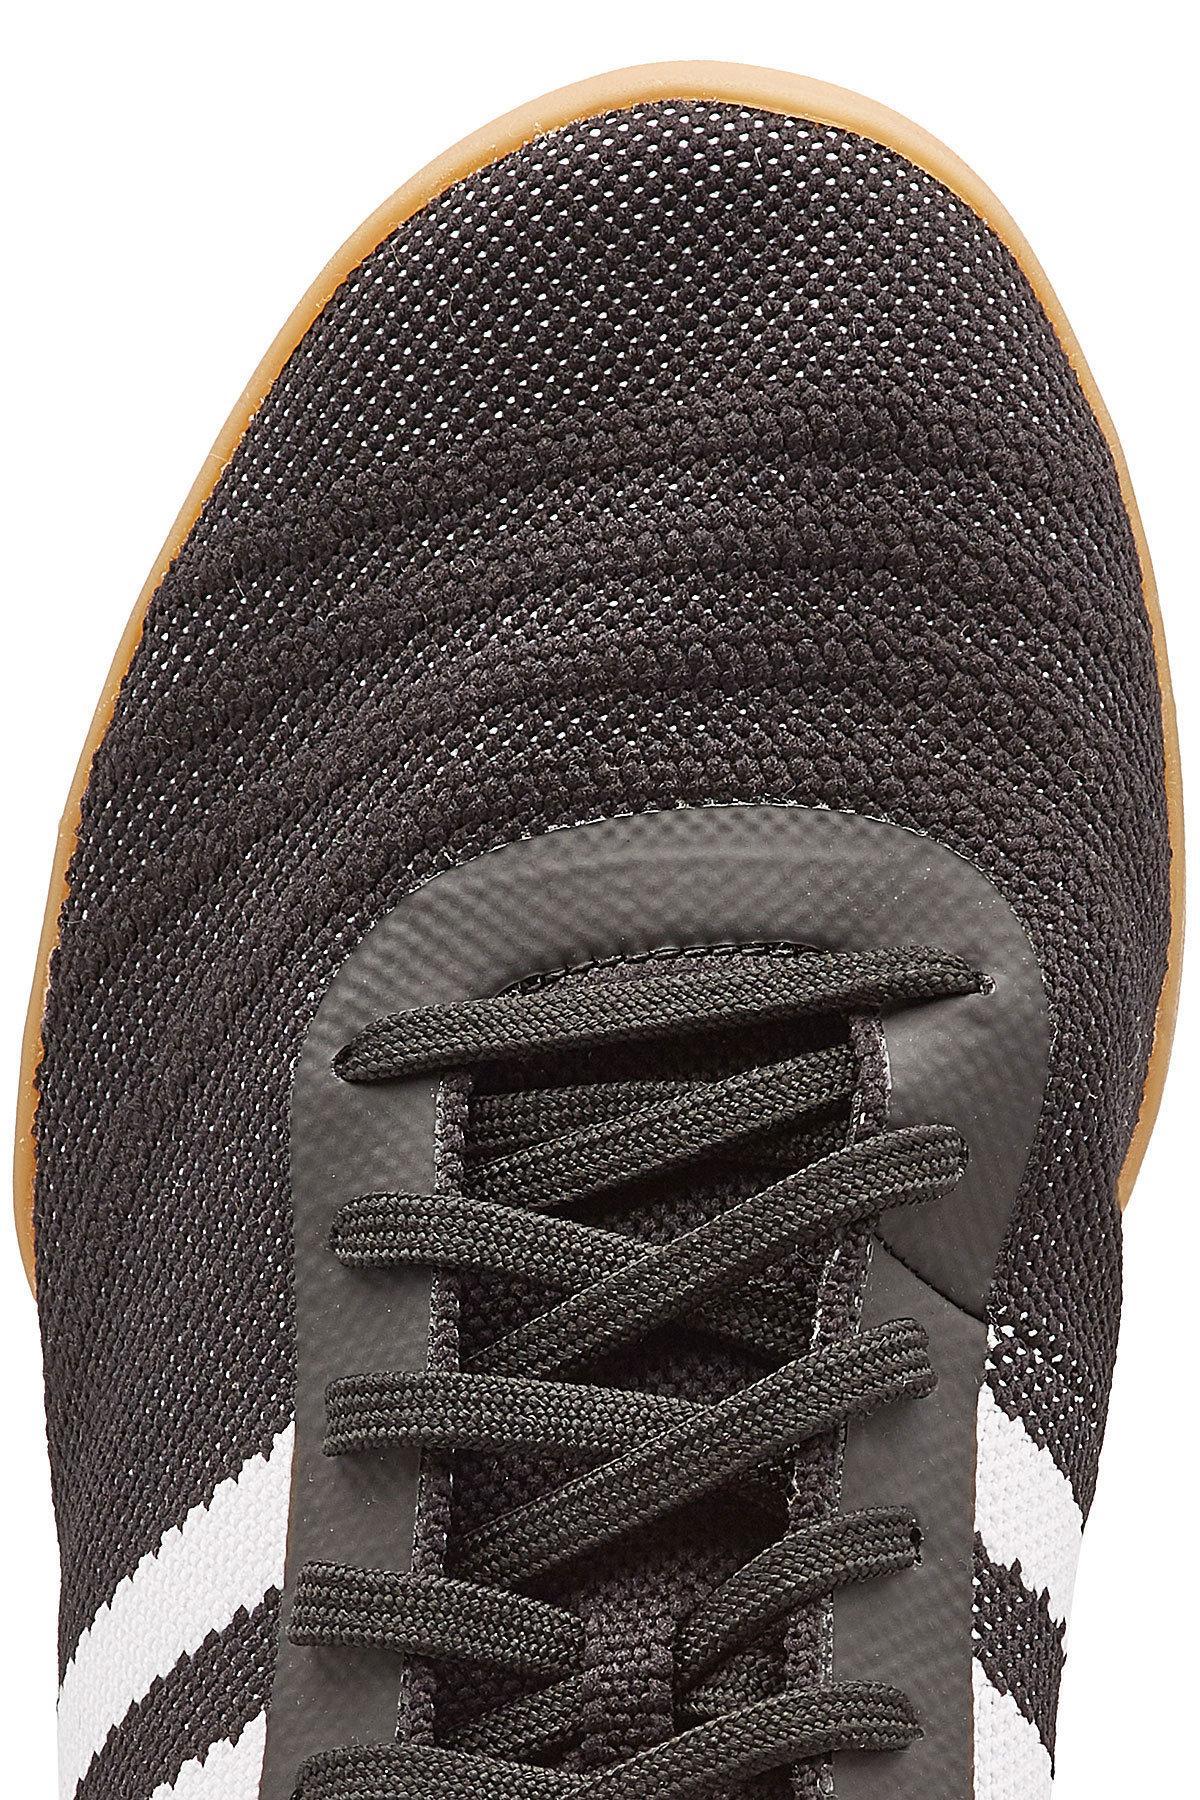 buy popular 16141 bd5e0 Adidas Originals - Multicolor Copa 70y Tr Sneakers With Mesh for Men -  Lyst. View fullscreen